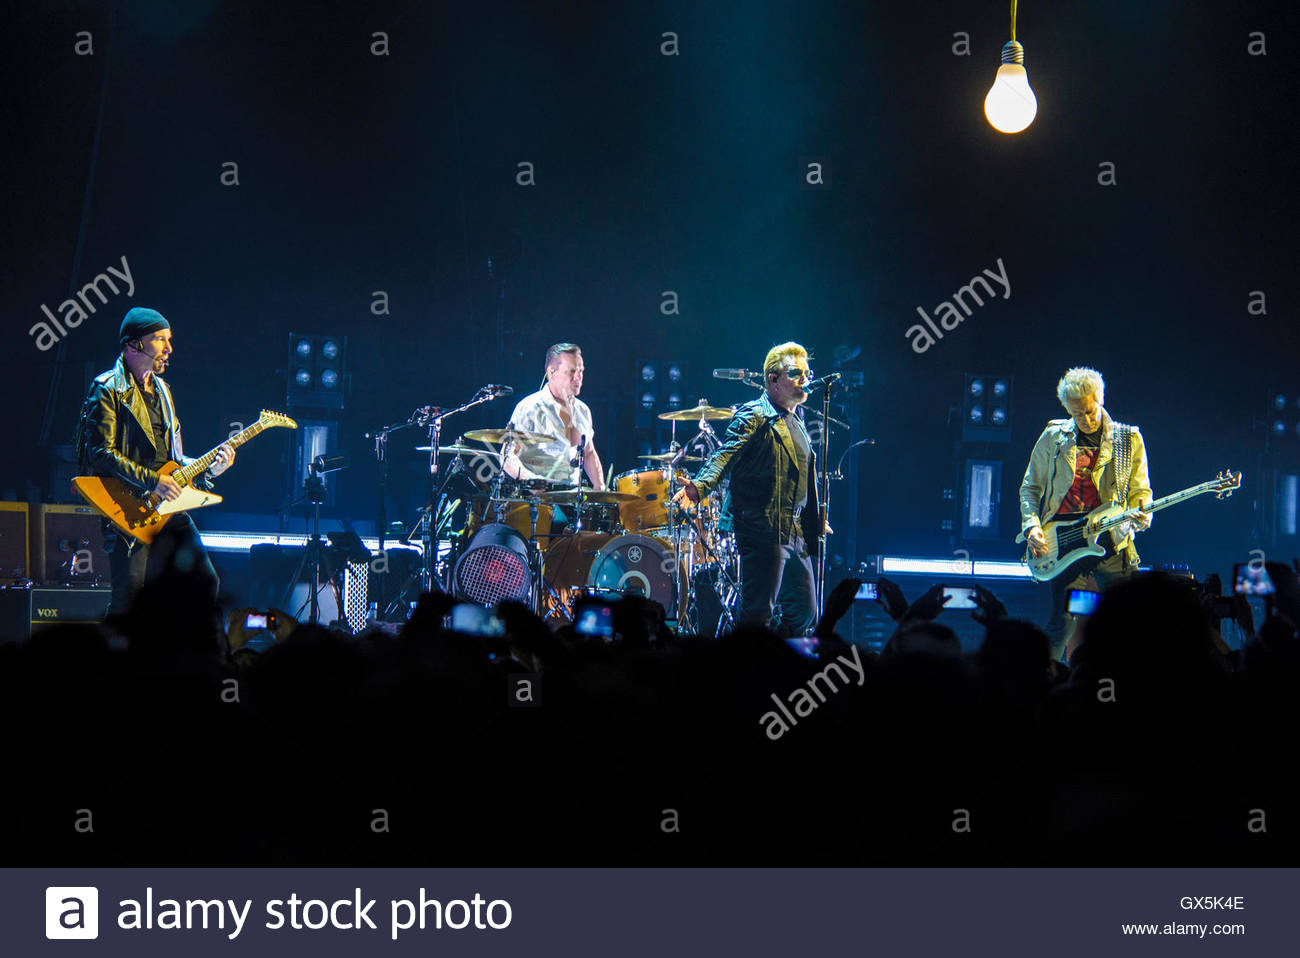 U2 performing live at 3Arena, Dublin, Ireland on November 24th 2015 © Shaun M. Neary - Stock Image